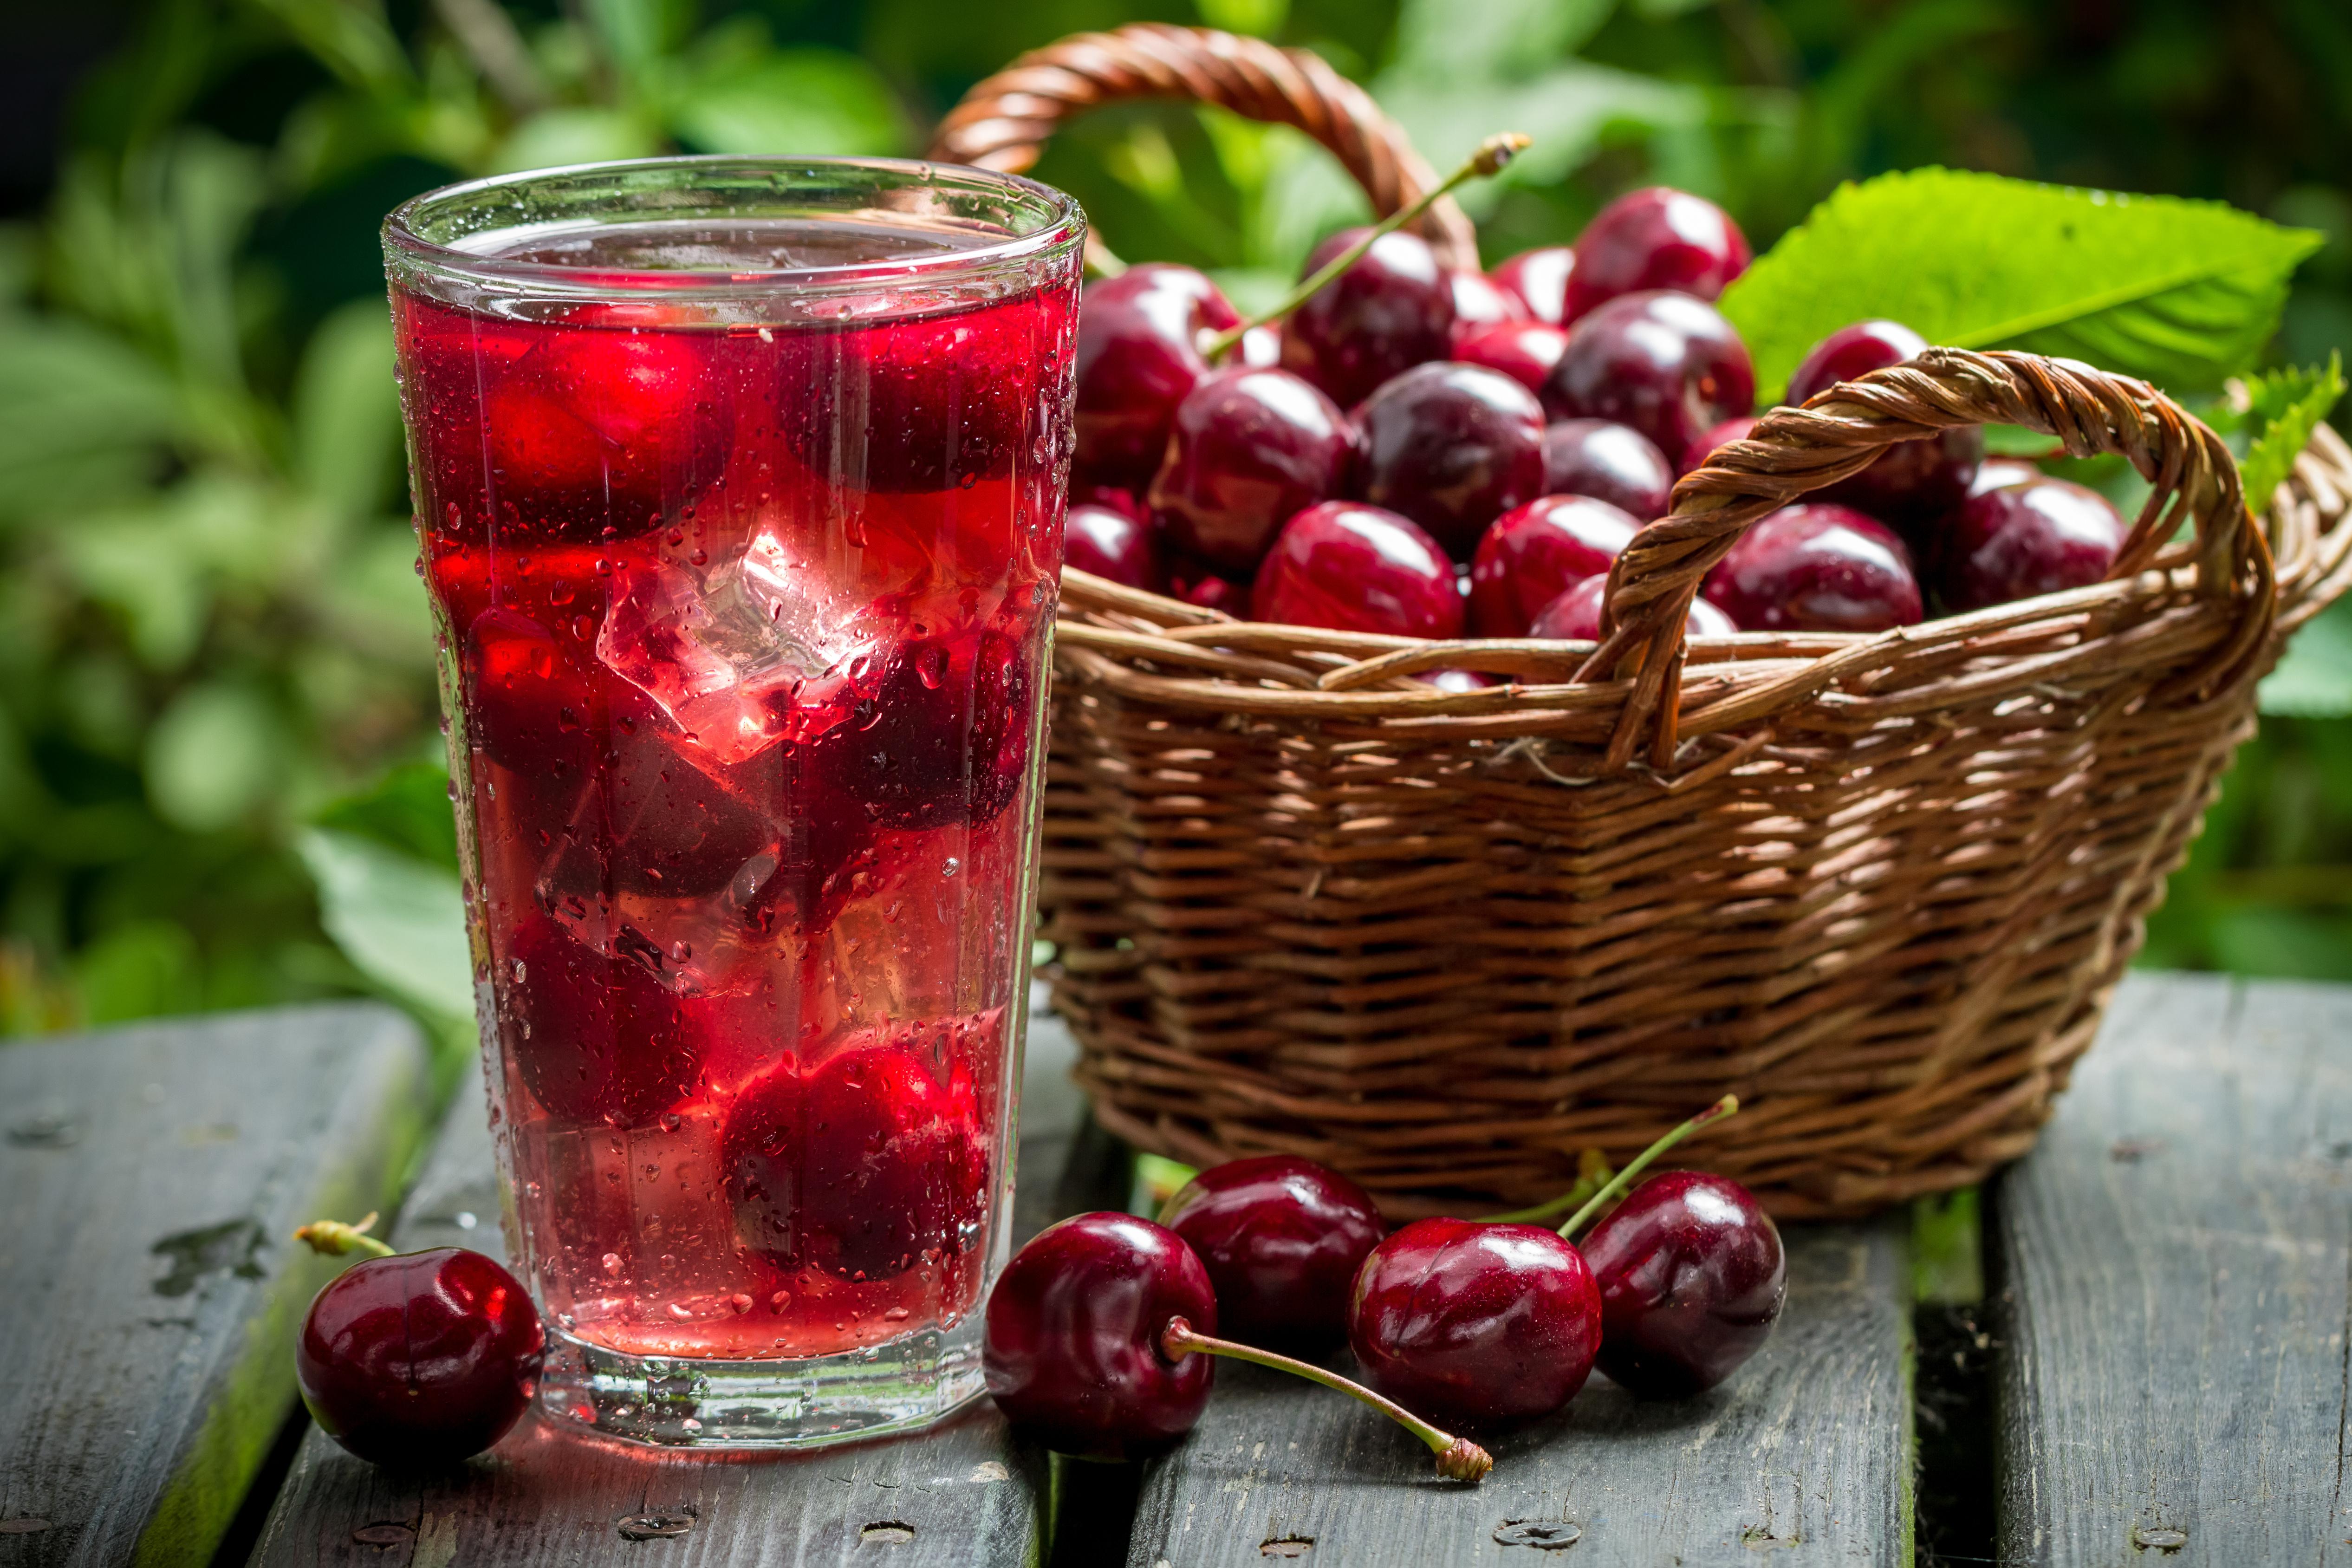 еда коктейль вишня лед food cocktail cherry ice загрузить